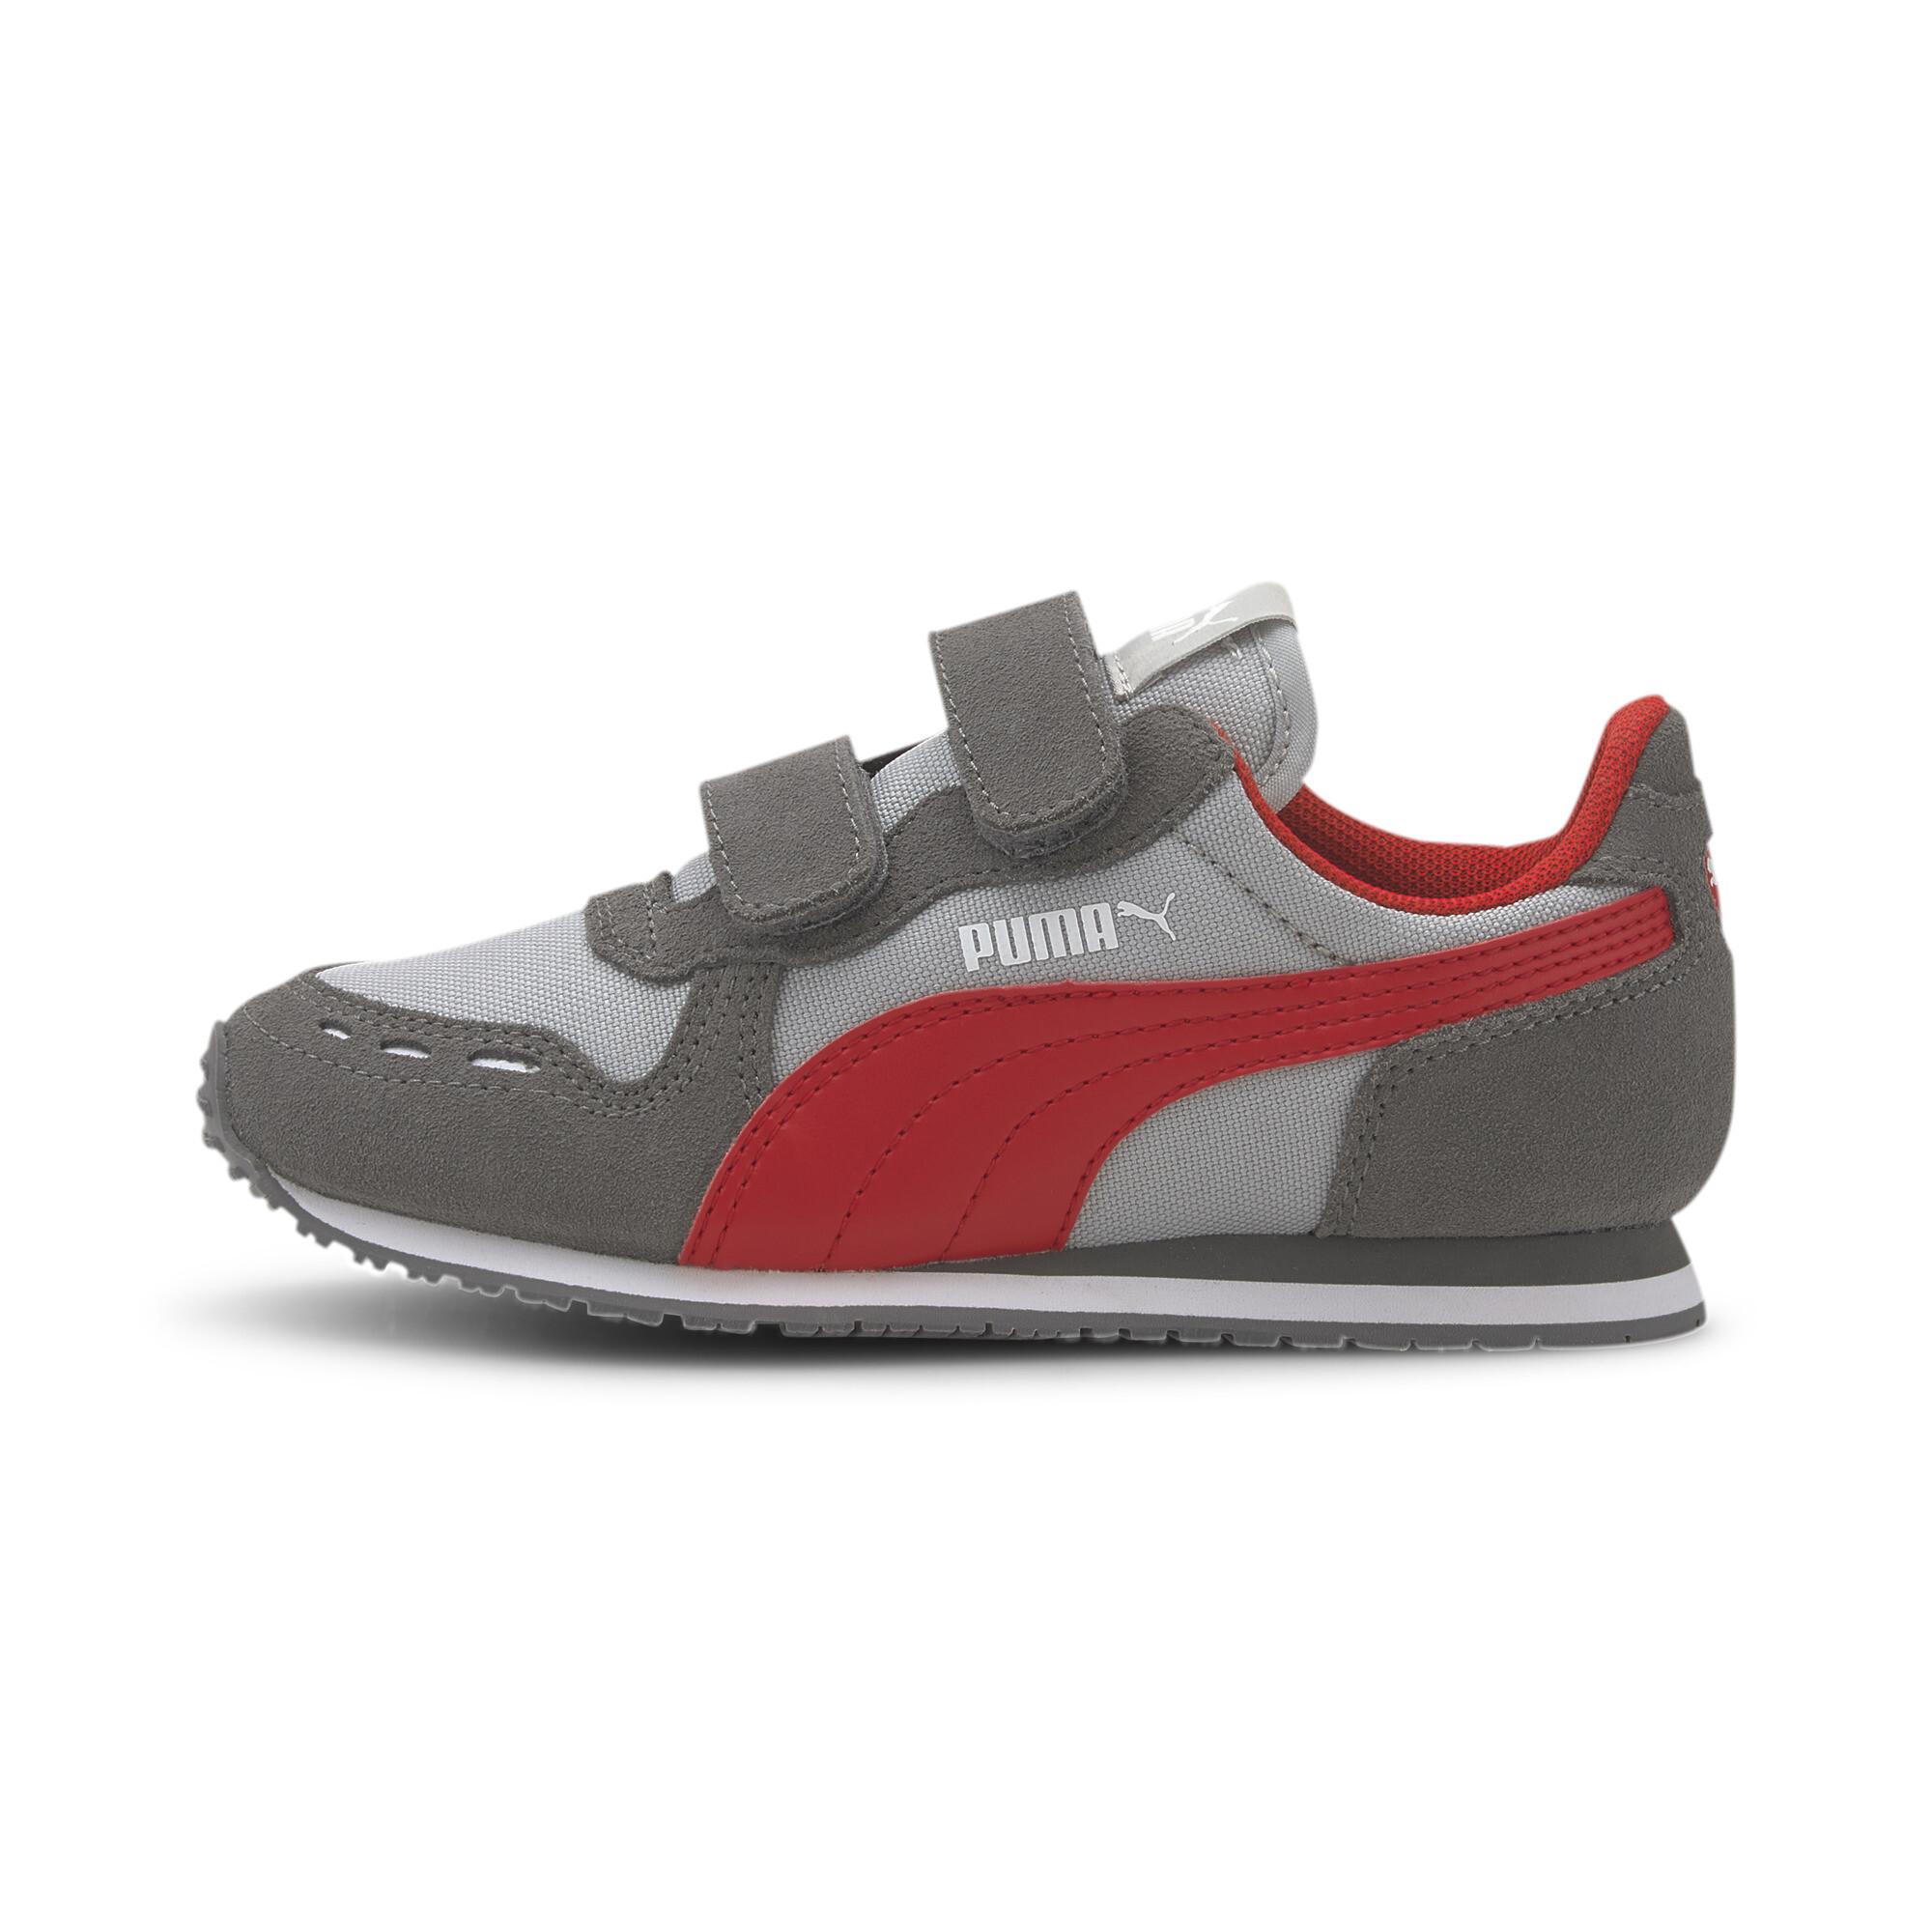 PUMA-Cabana-Racer-Little-Kids-039-Shoes-Kids-Shoe-Kids thumbnail 27